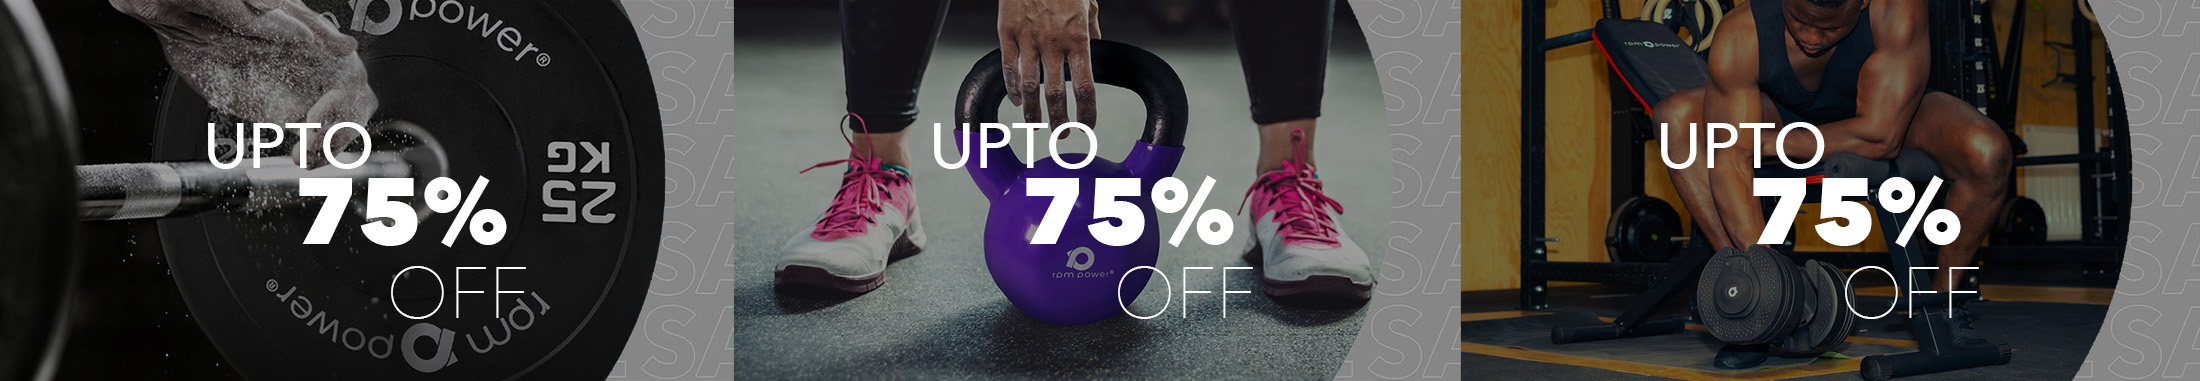 fitness equipment sale header desktop rpmpower.com